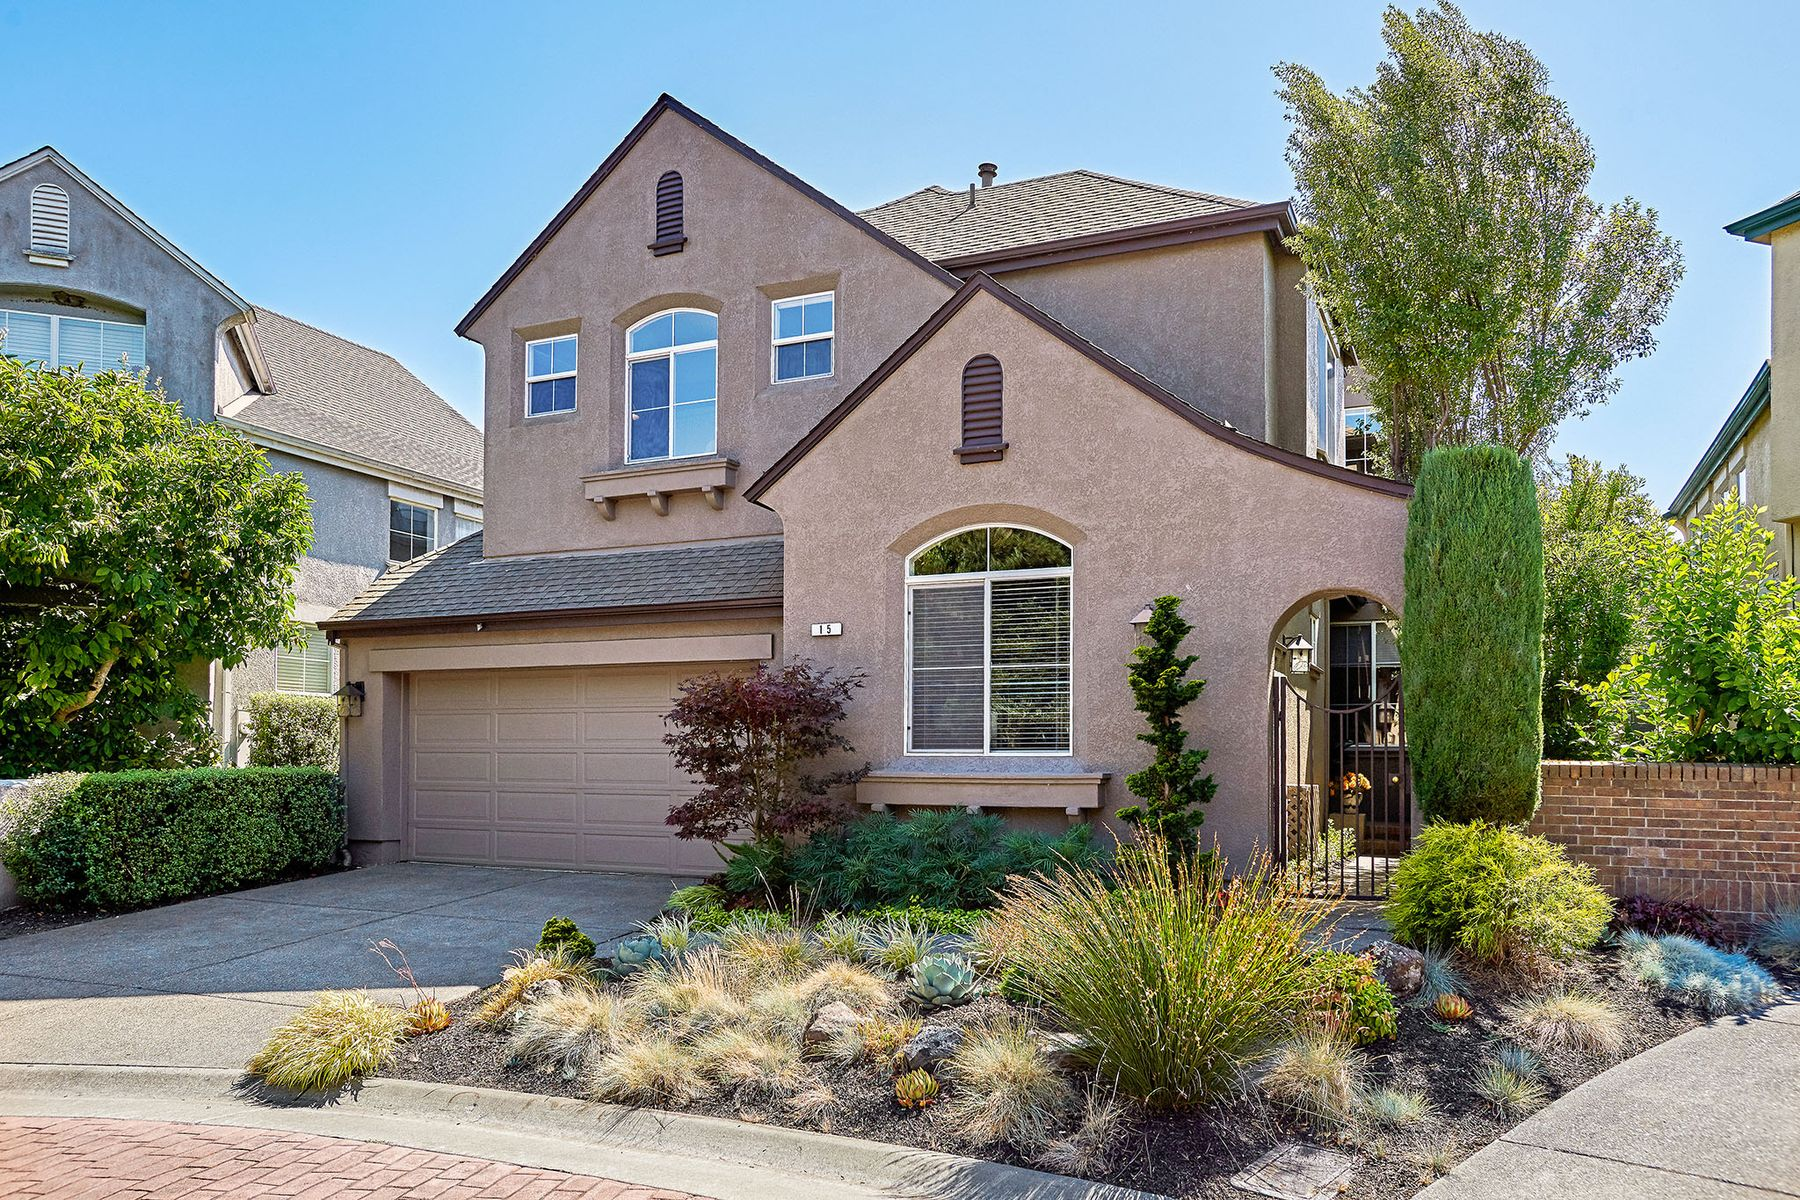 Single Family Homes for Sale at Desirable home in Adobe Creek 15 Sapporo Ct Petaluma, California 94954 United States